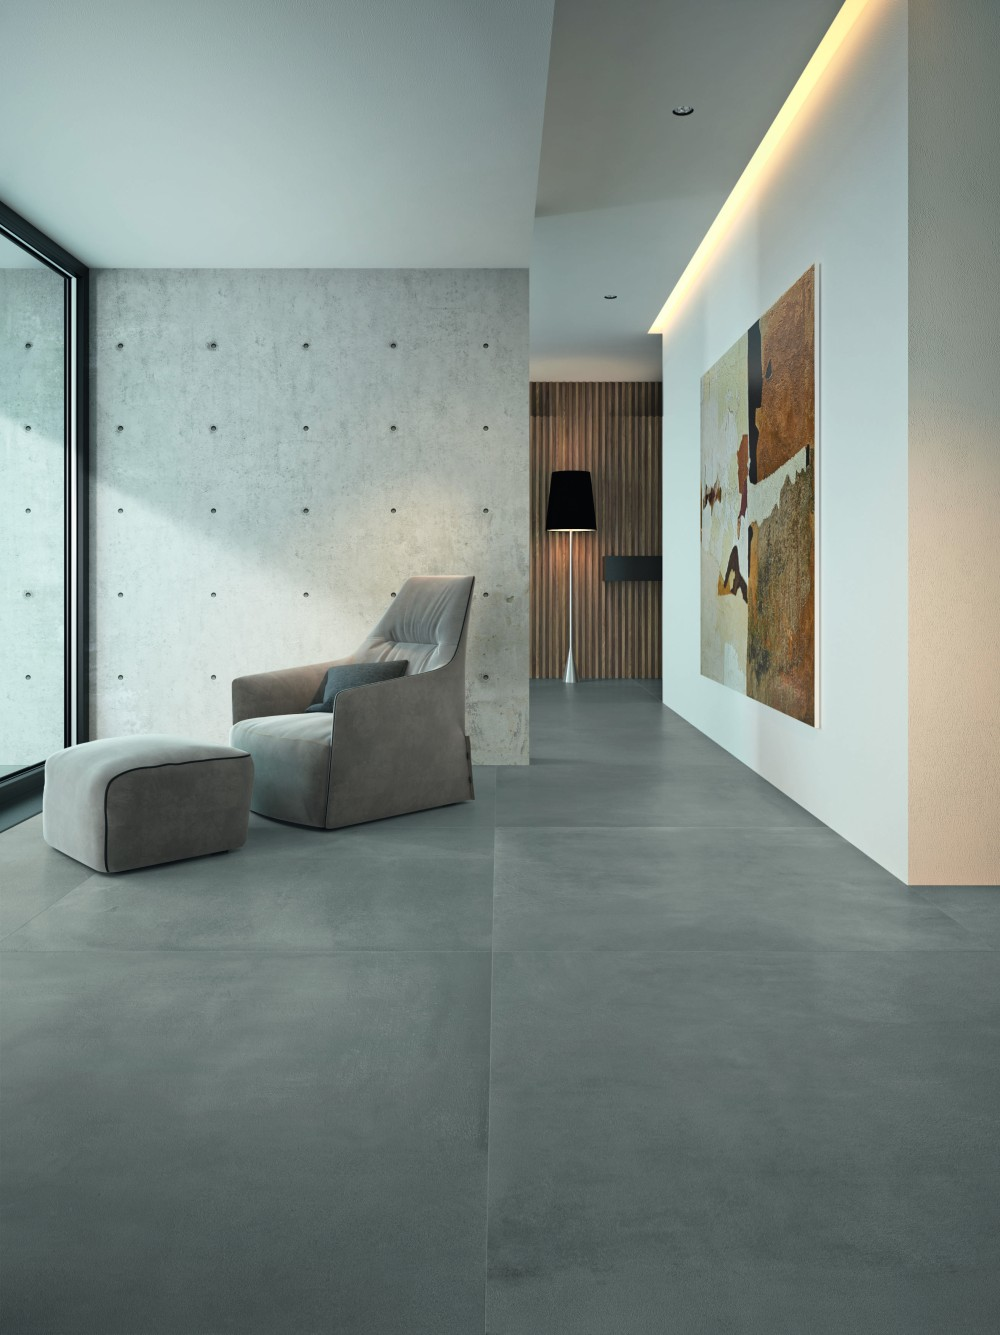 Marazzi_Grande_Concrete_Look_002 kopia.jpg